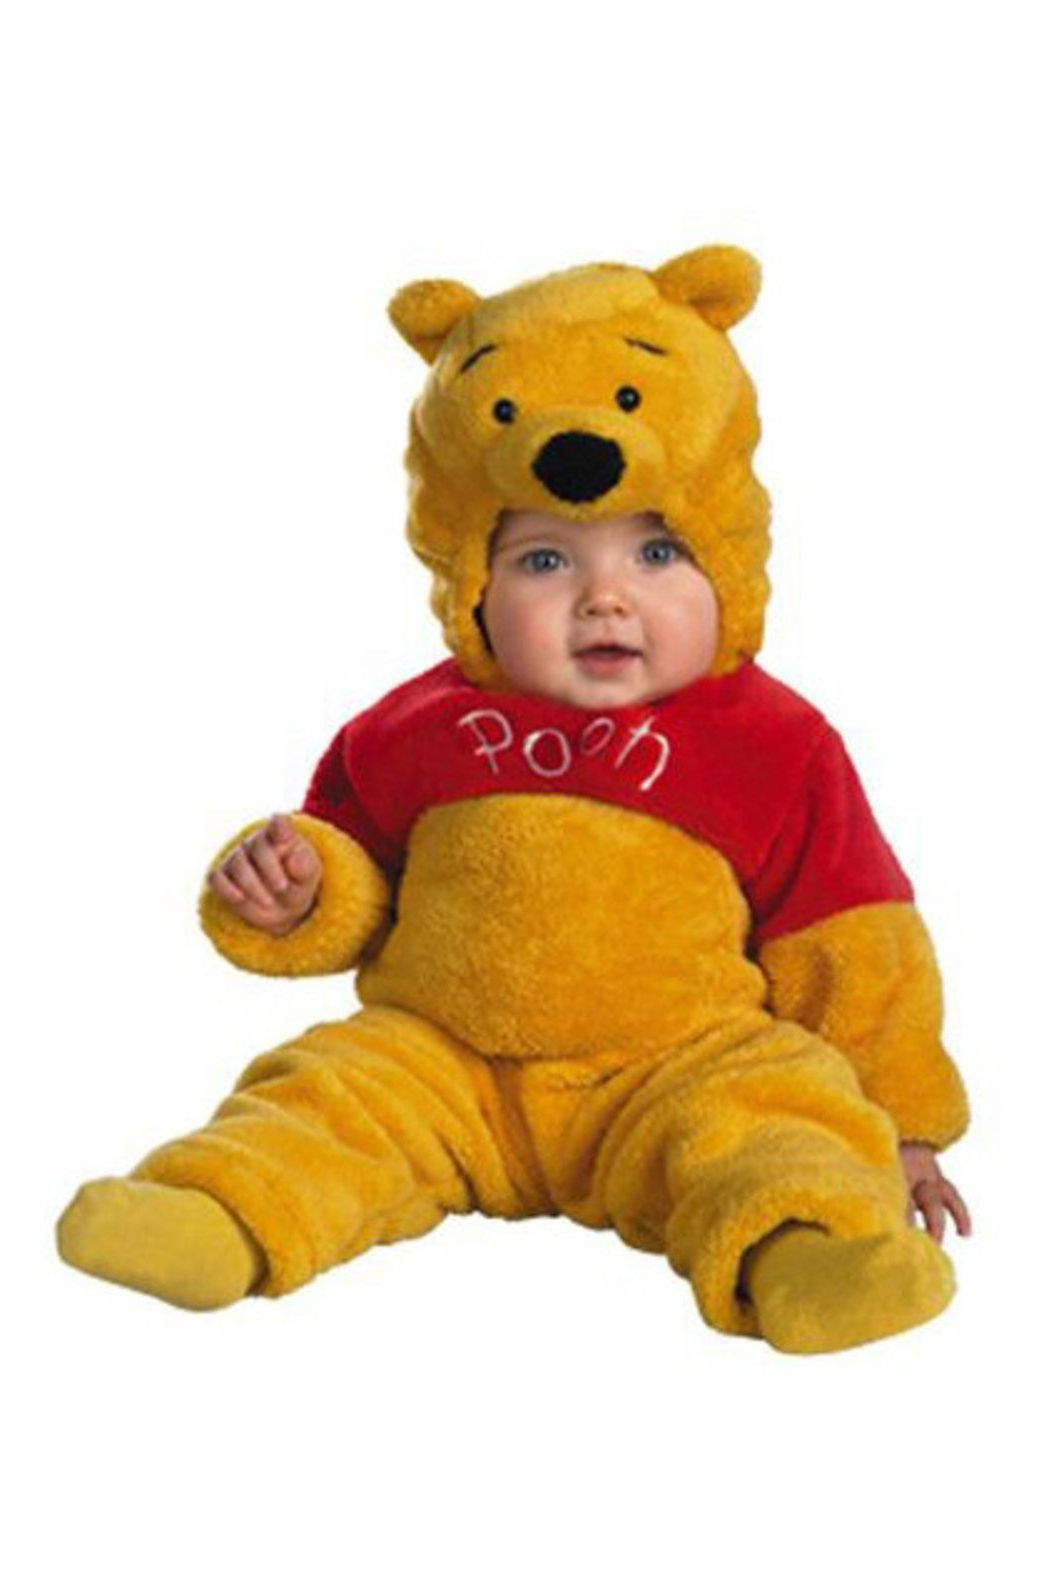 disney halloween costumes, winnie the pooh costume